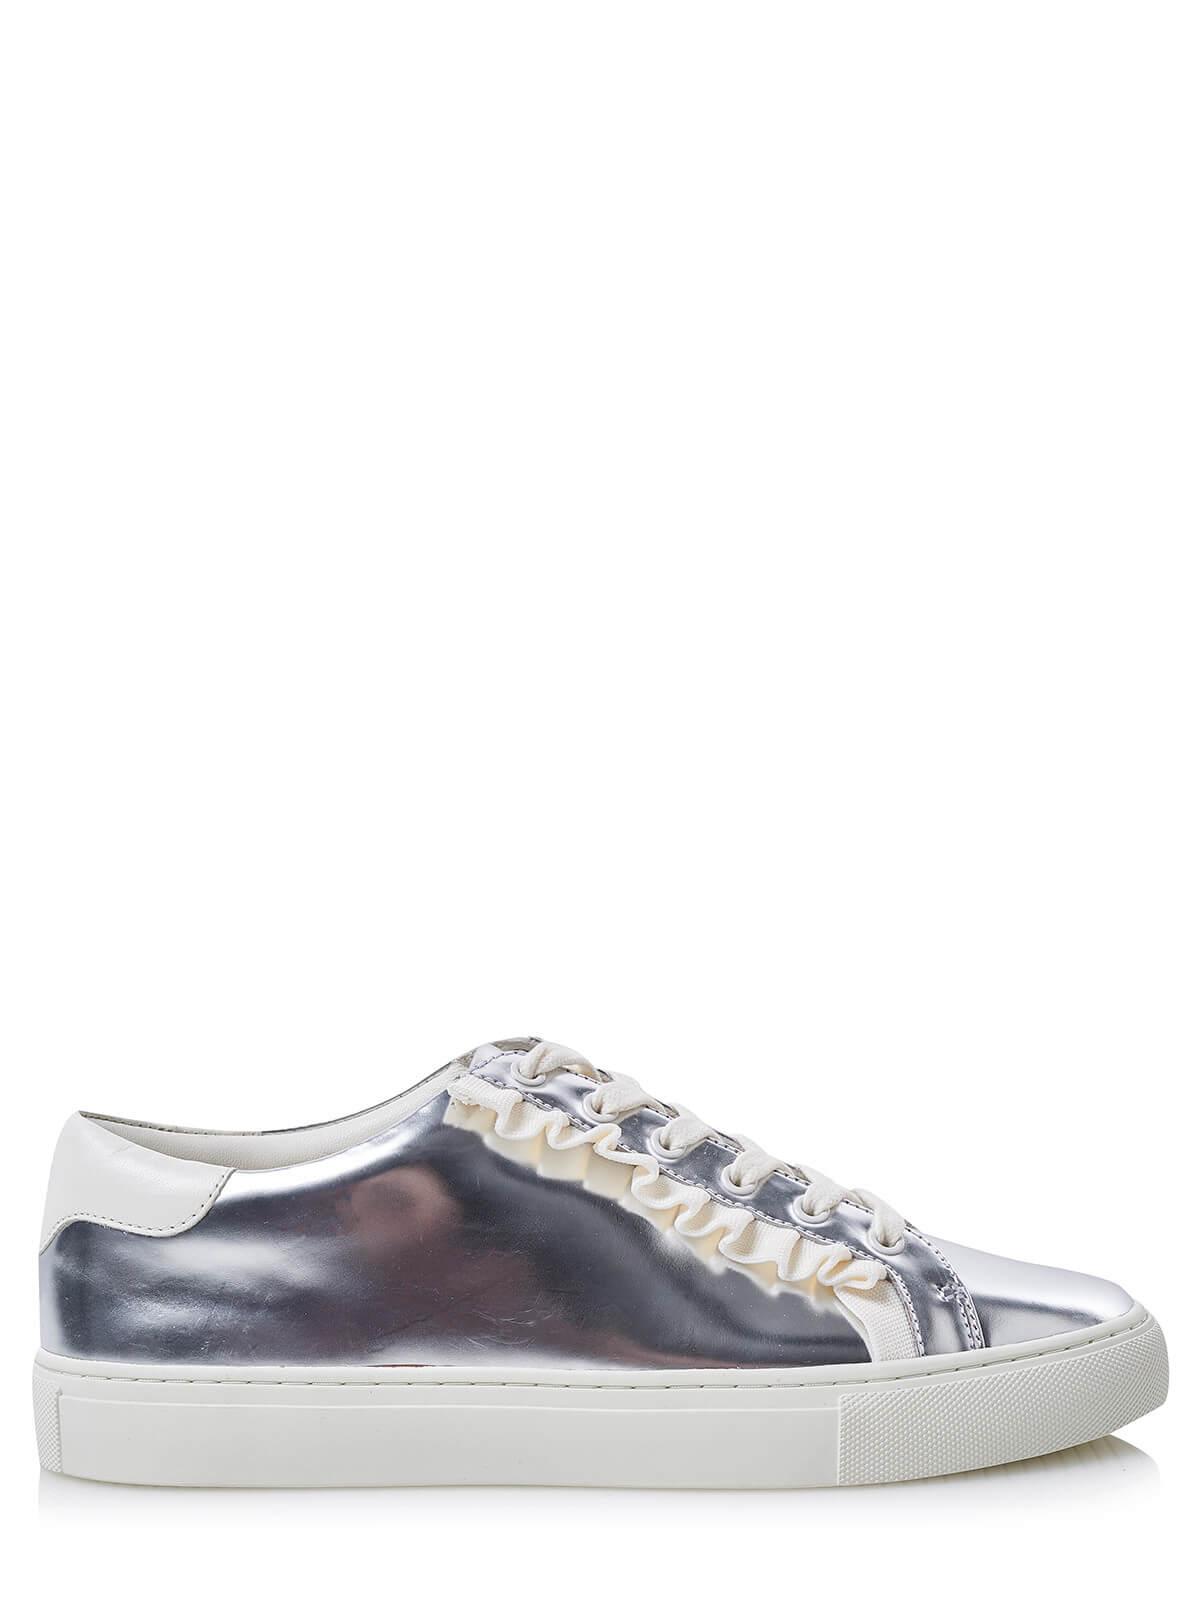 37cbc7a69 Tory Burch Sneaker